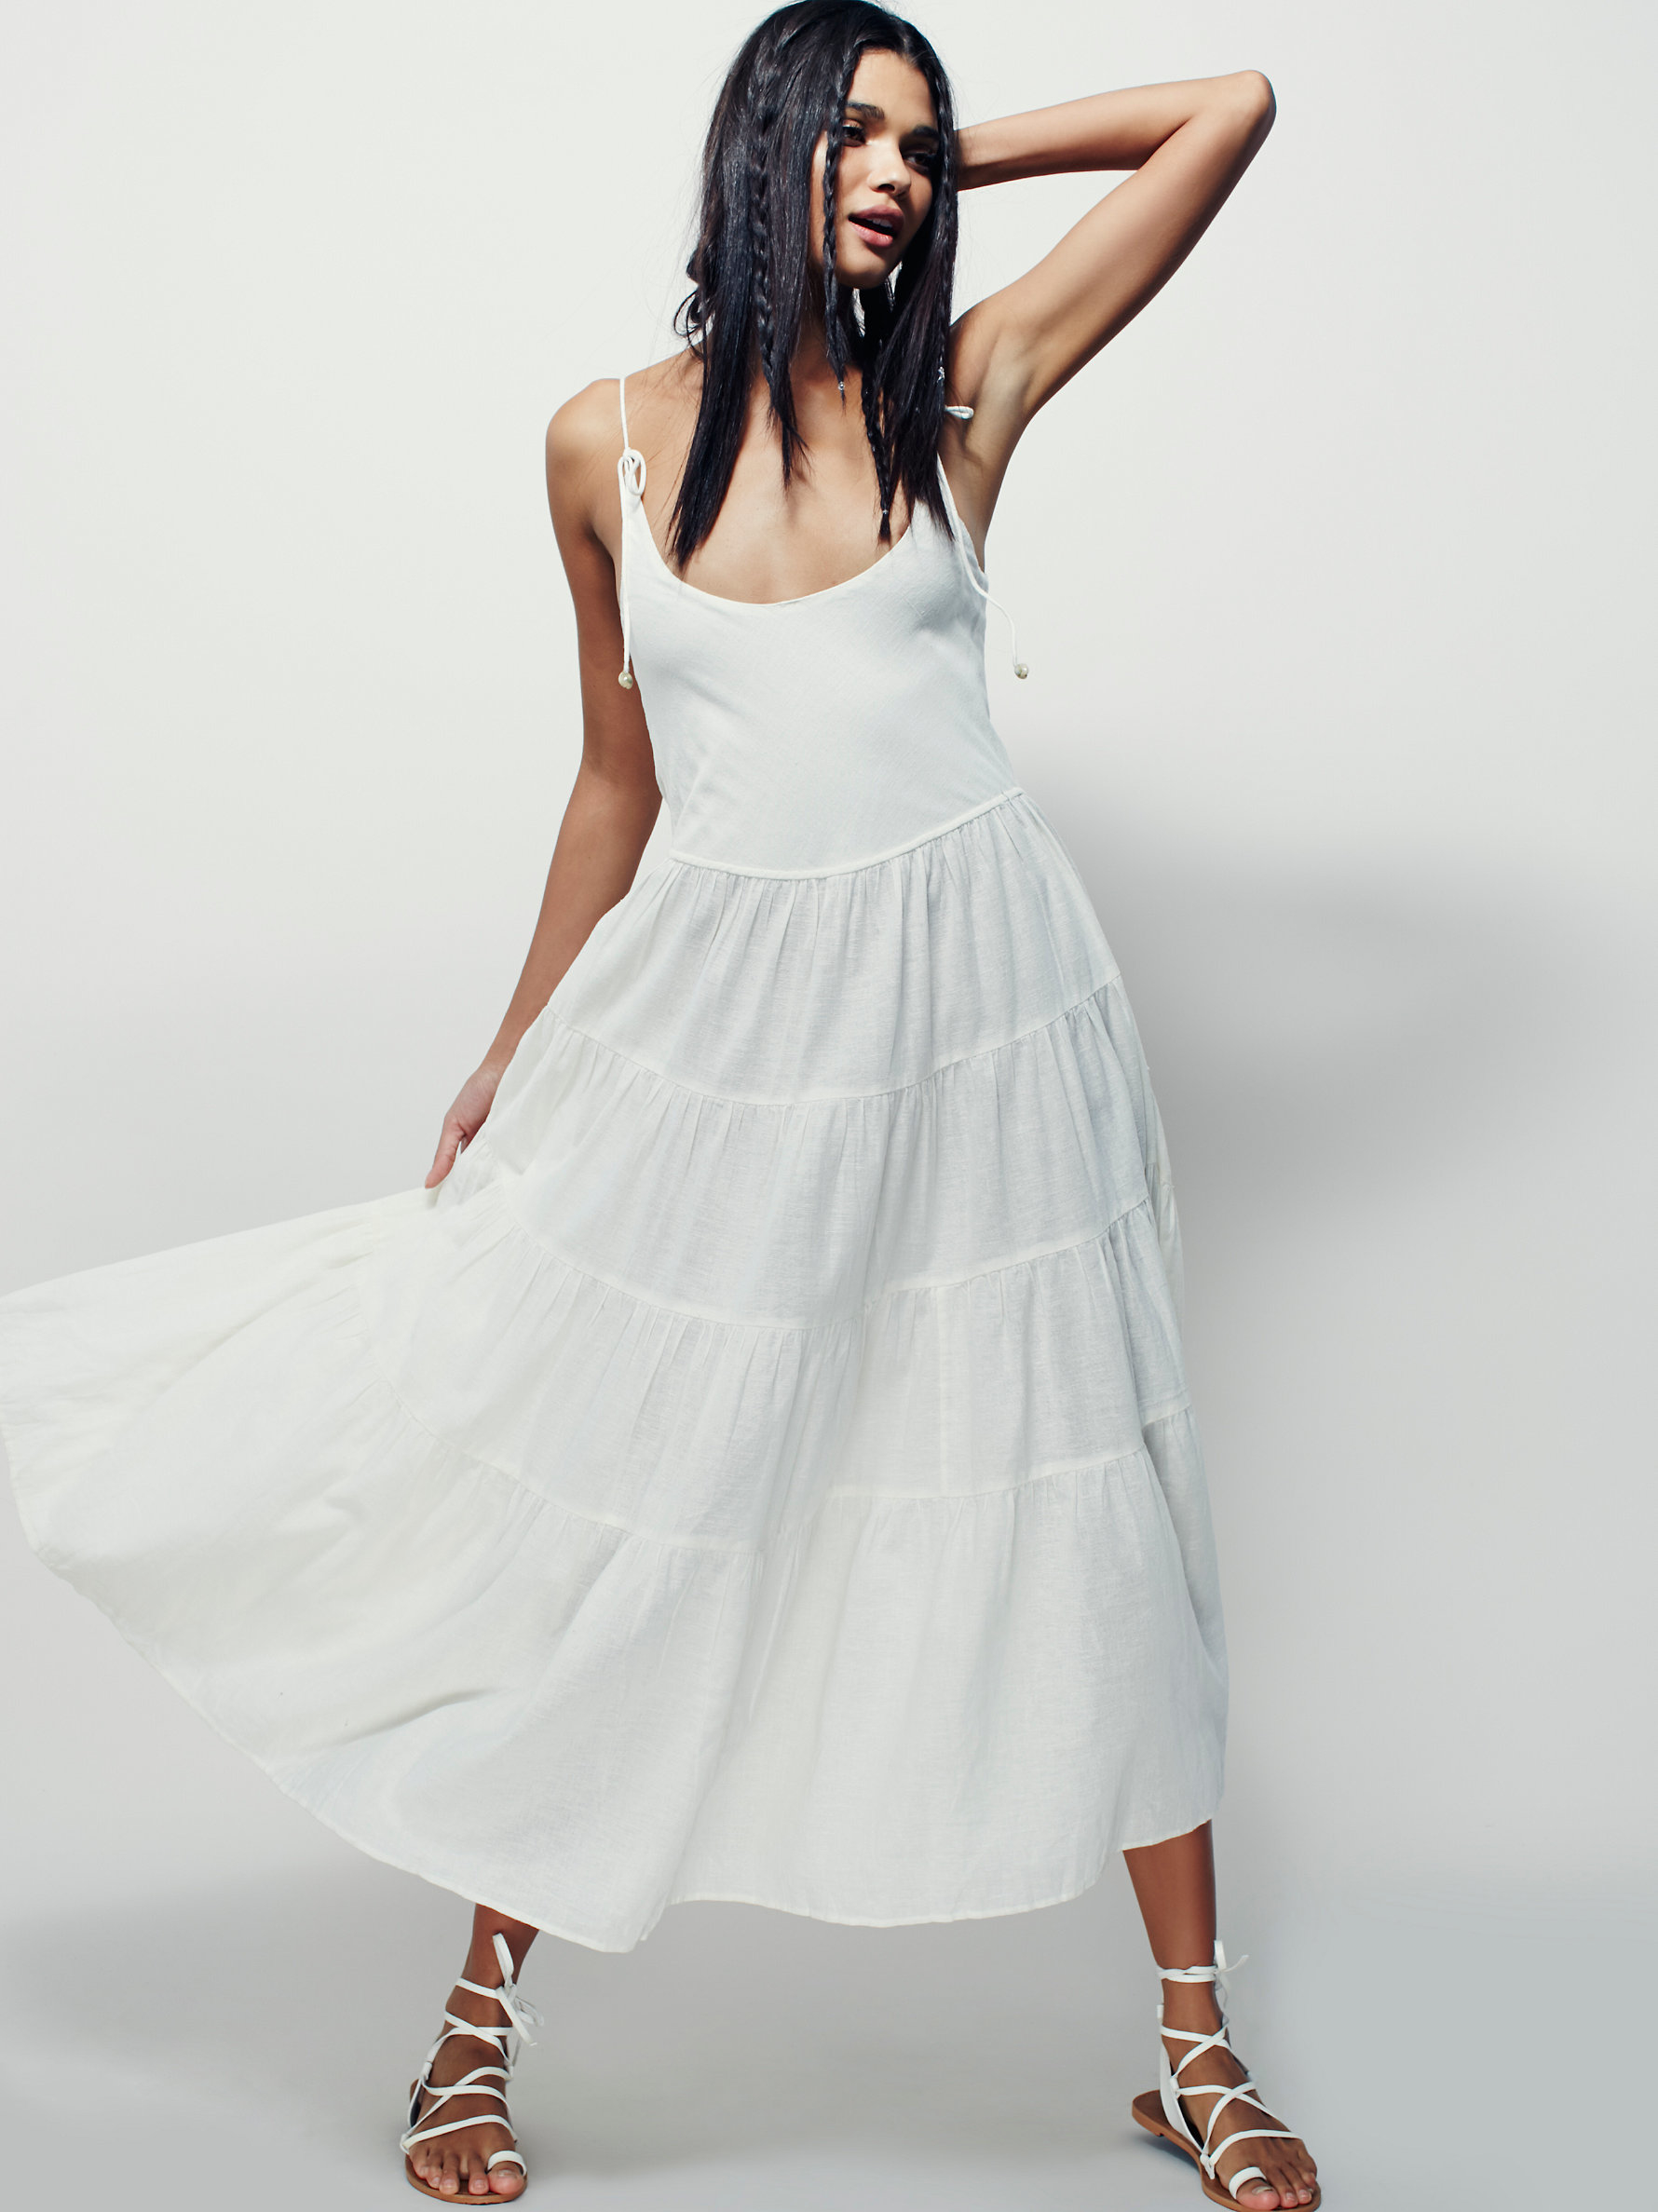 Free People Bianca Dress In White